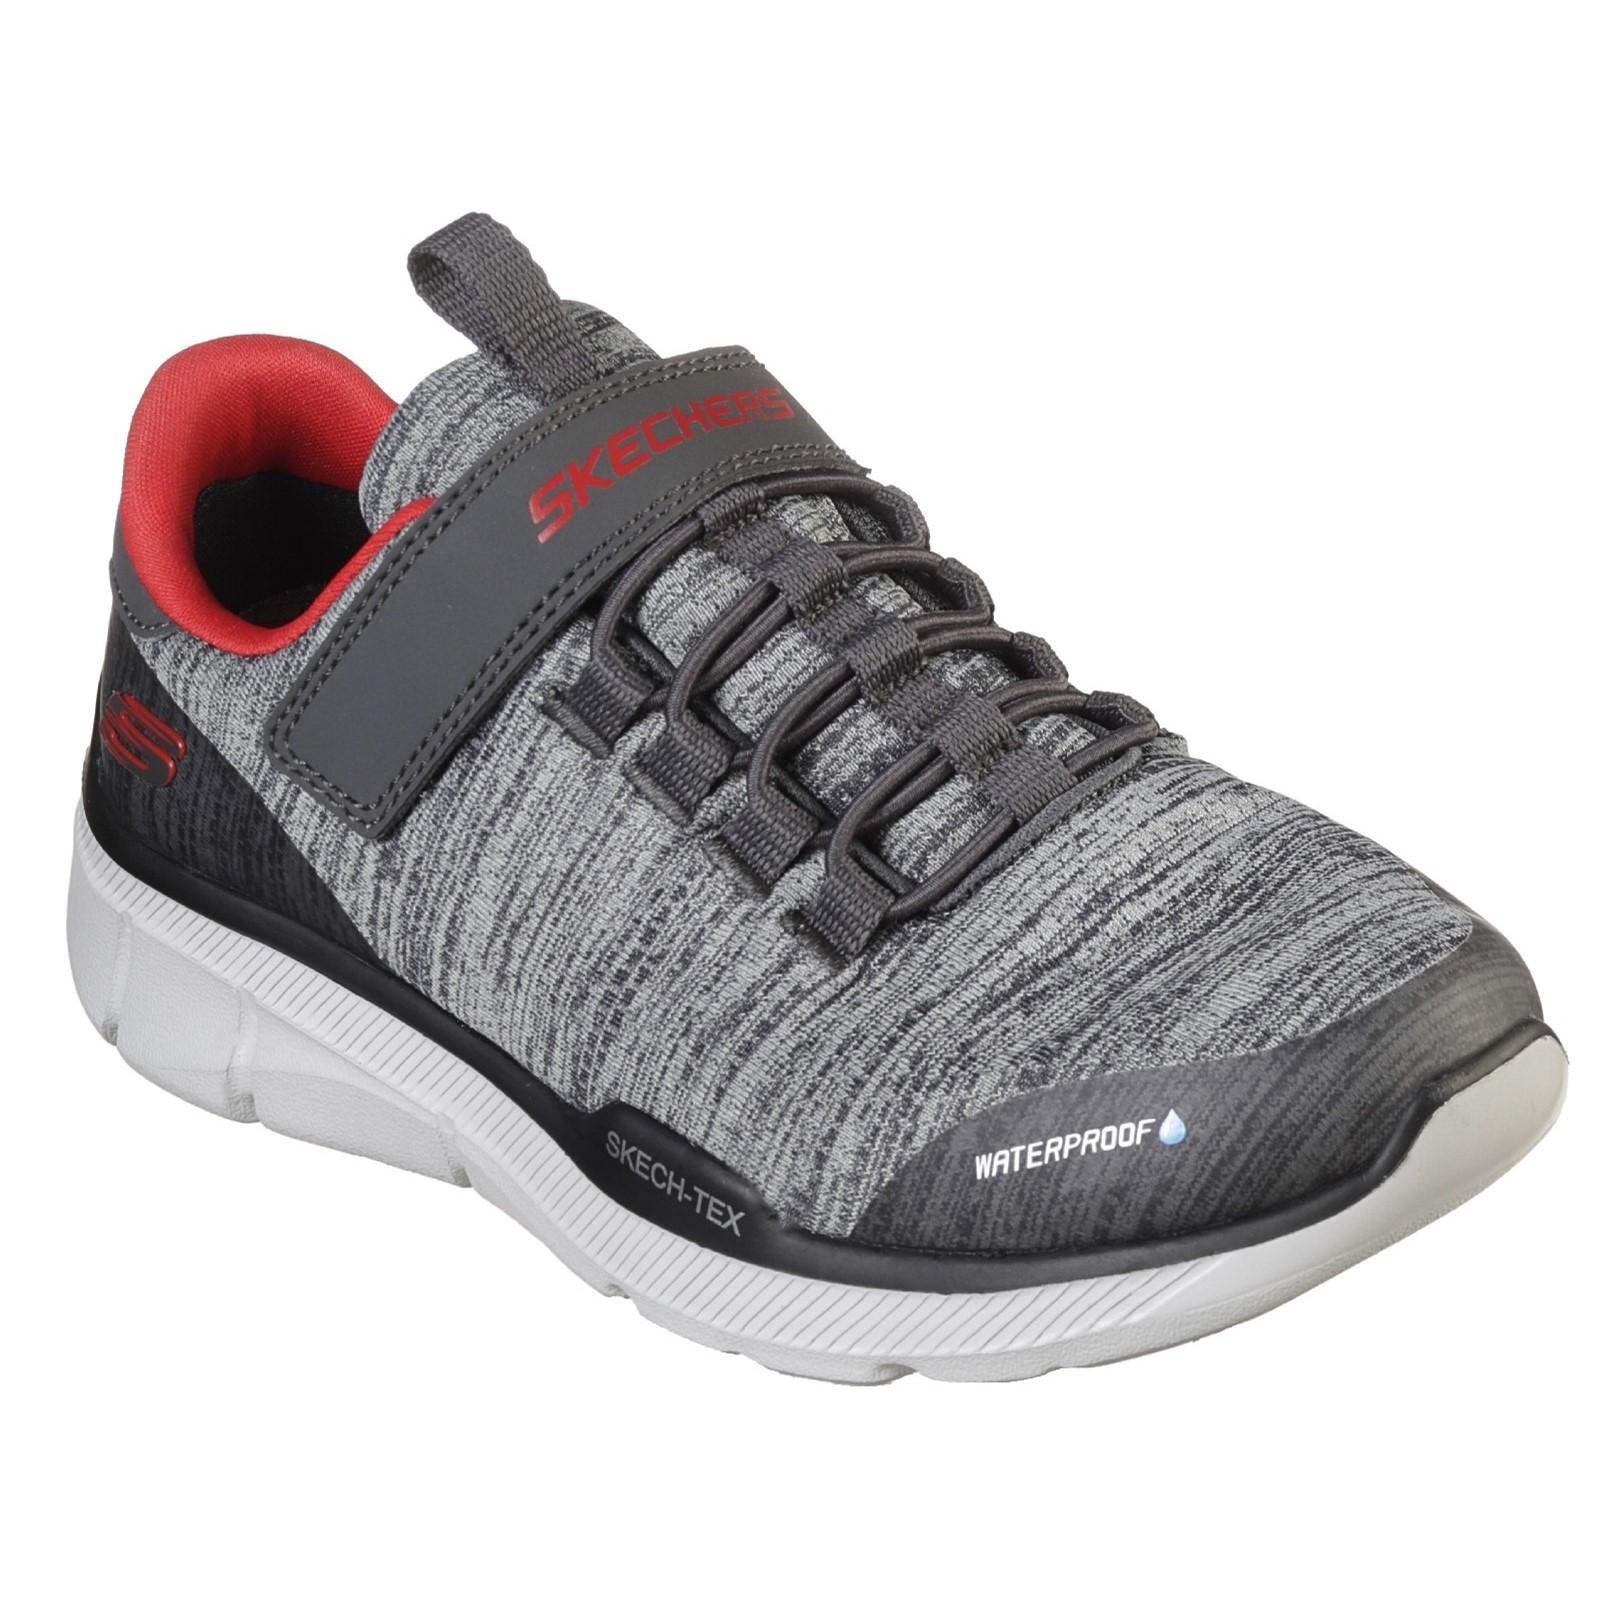 Skechers Kids Equalizer 3.0 Gore & Strap Waterproof Upper shoes